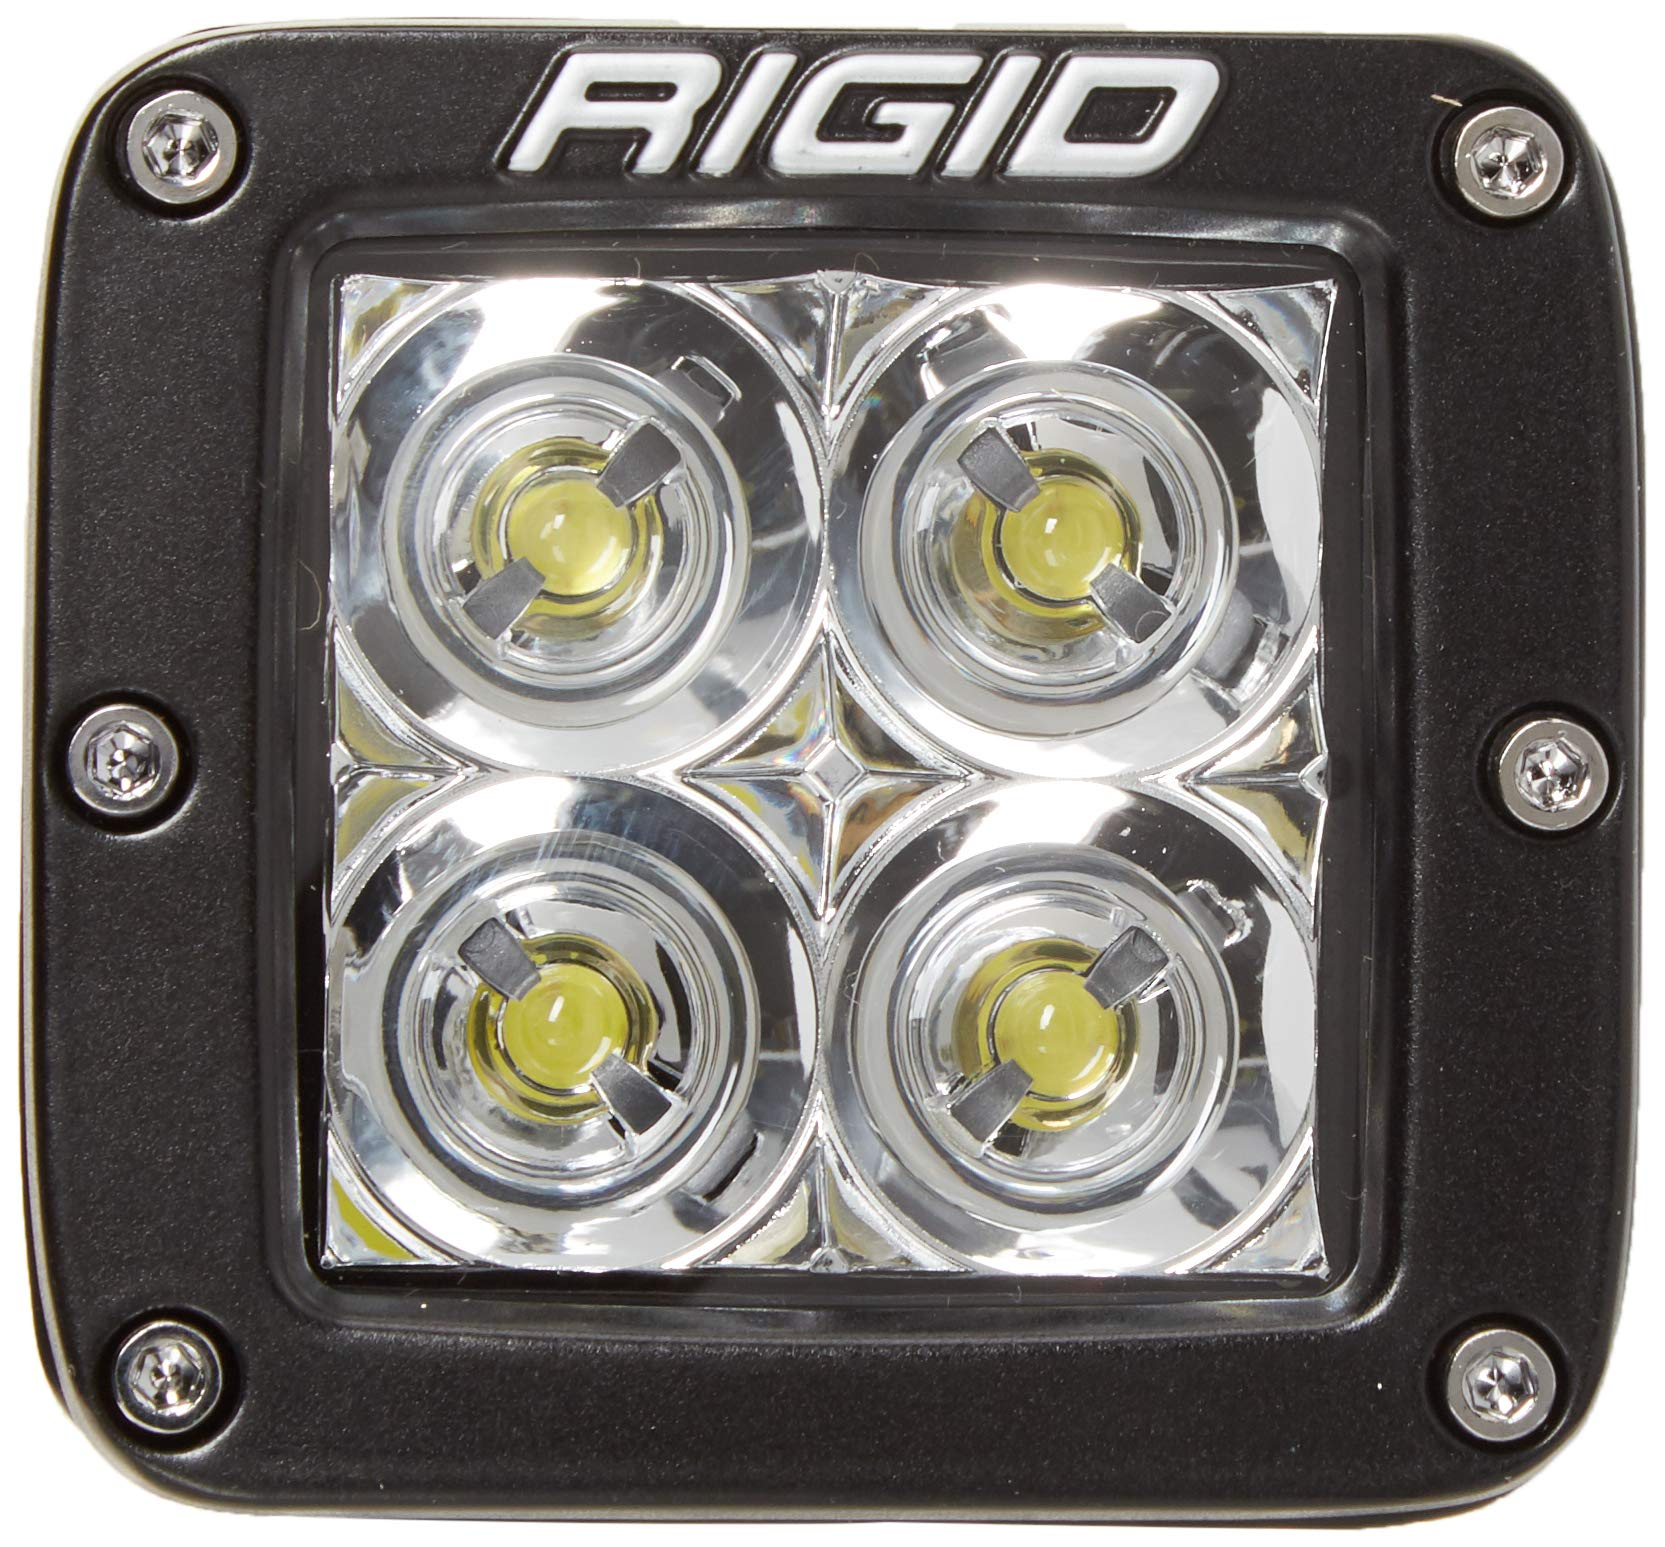 Set of 2 Rigid Industries 20211 Dually Floodlight,